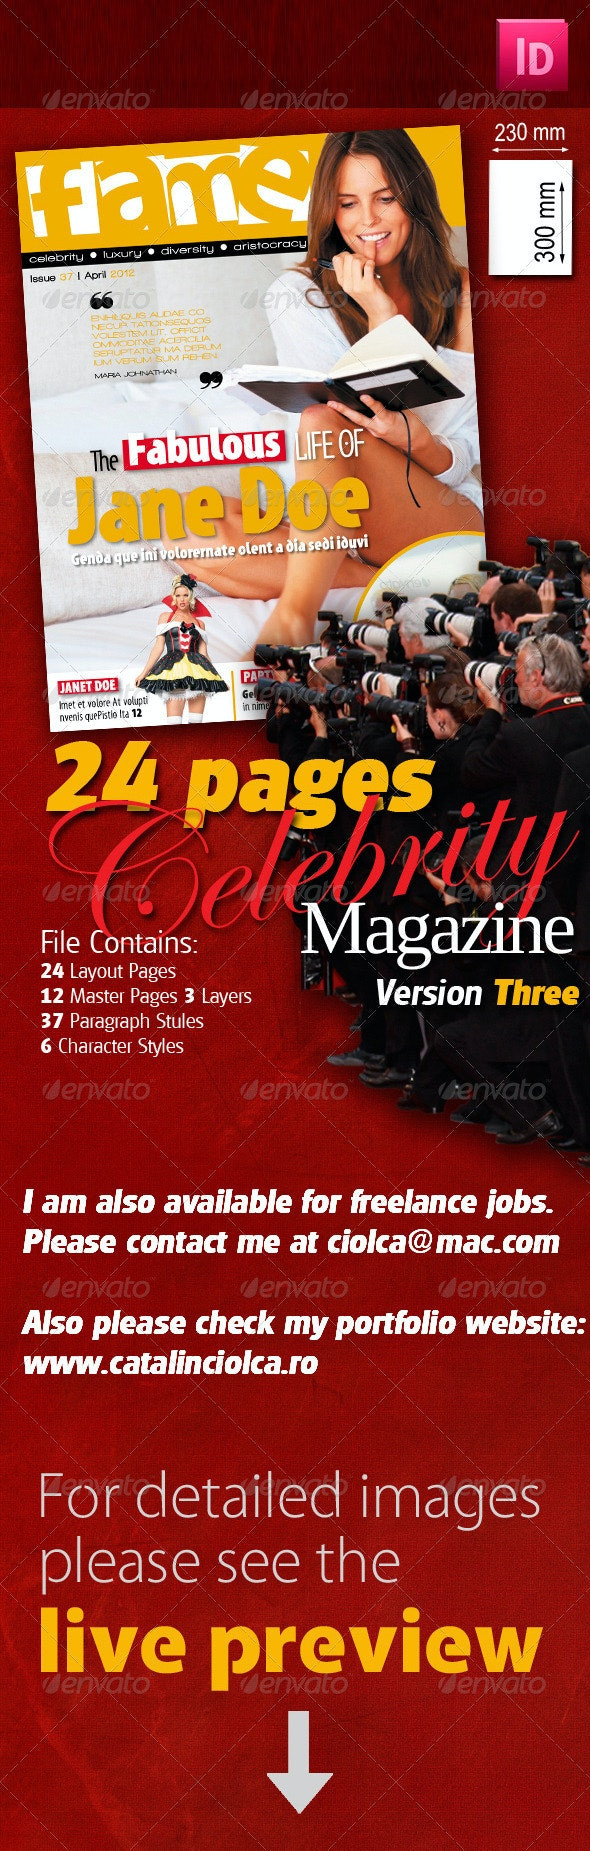 24 Pages Celebrity Magazine Version Three - Magazines Print Templates